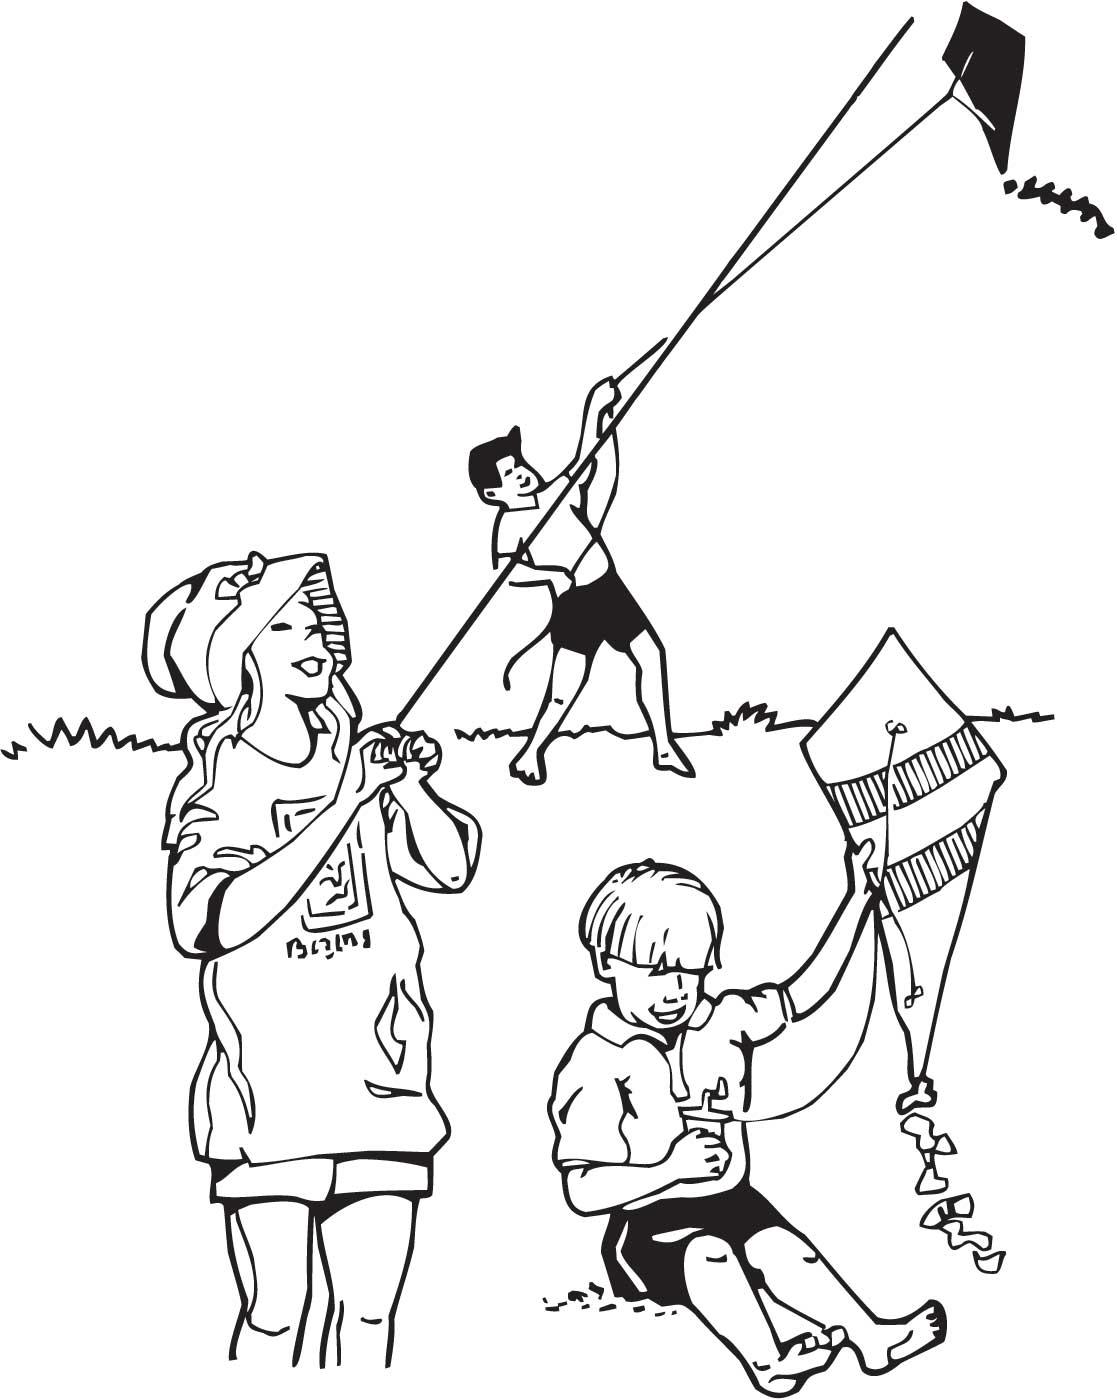 Kite Drawing At Getdrawings